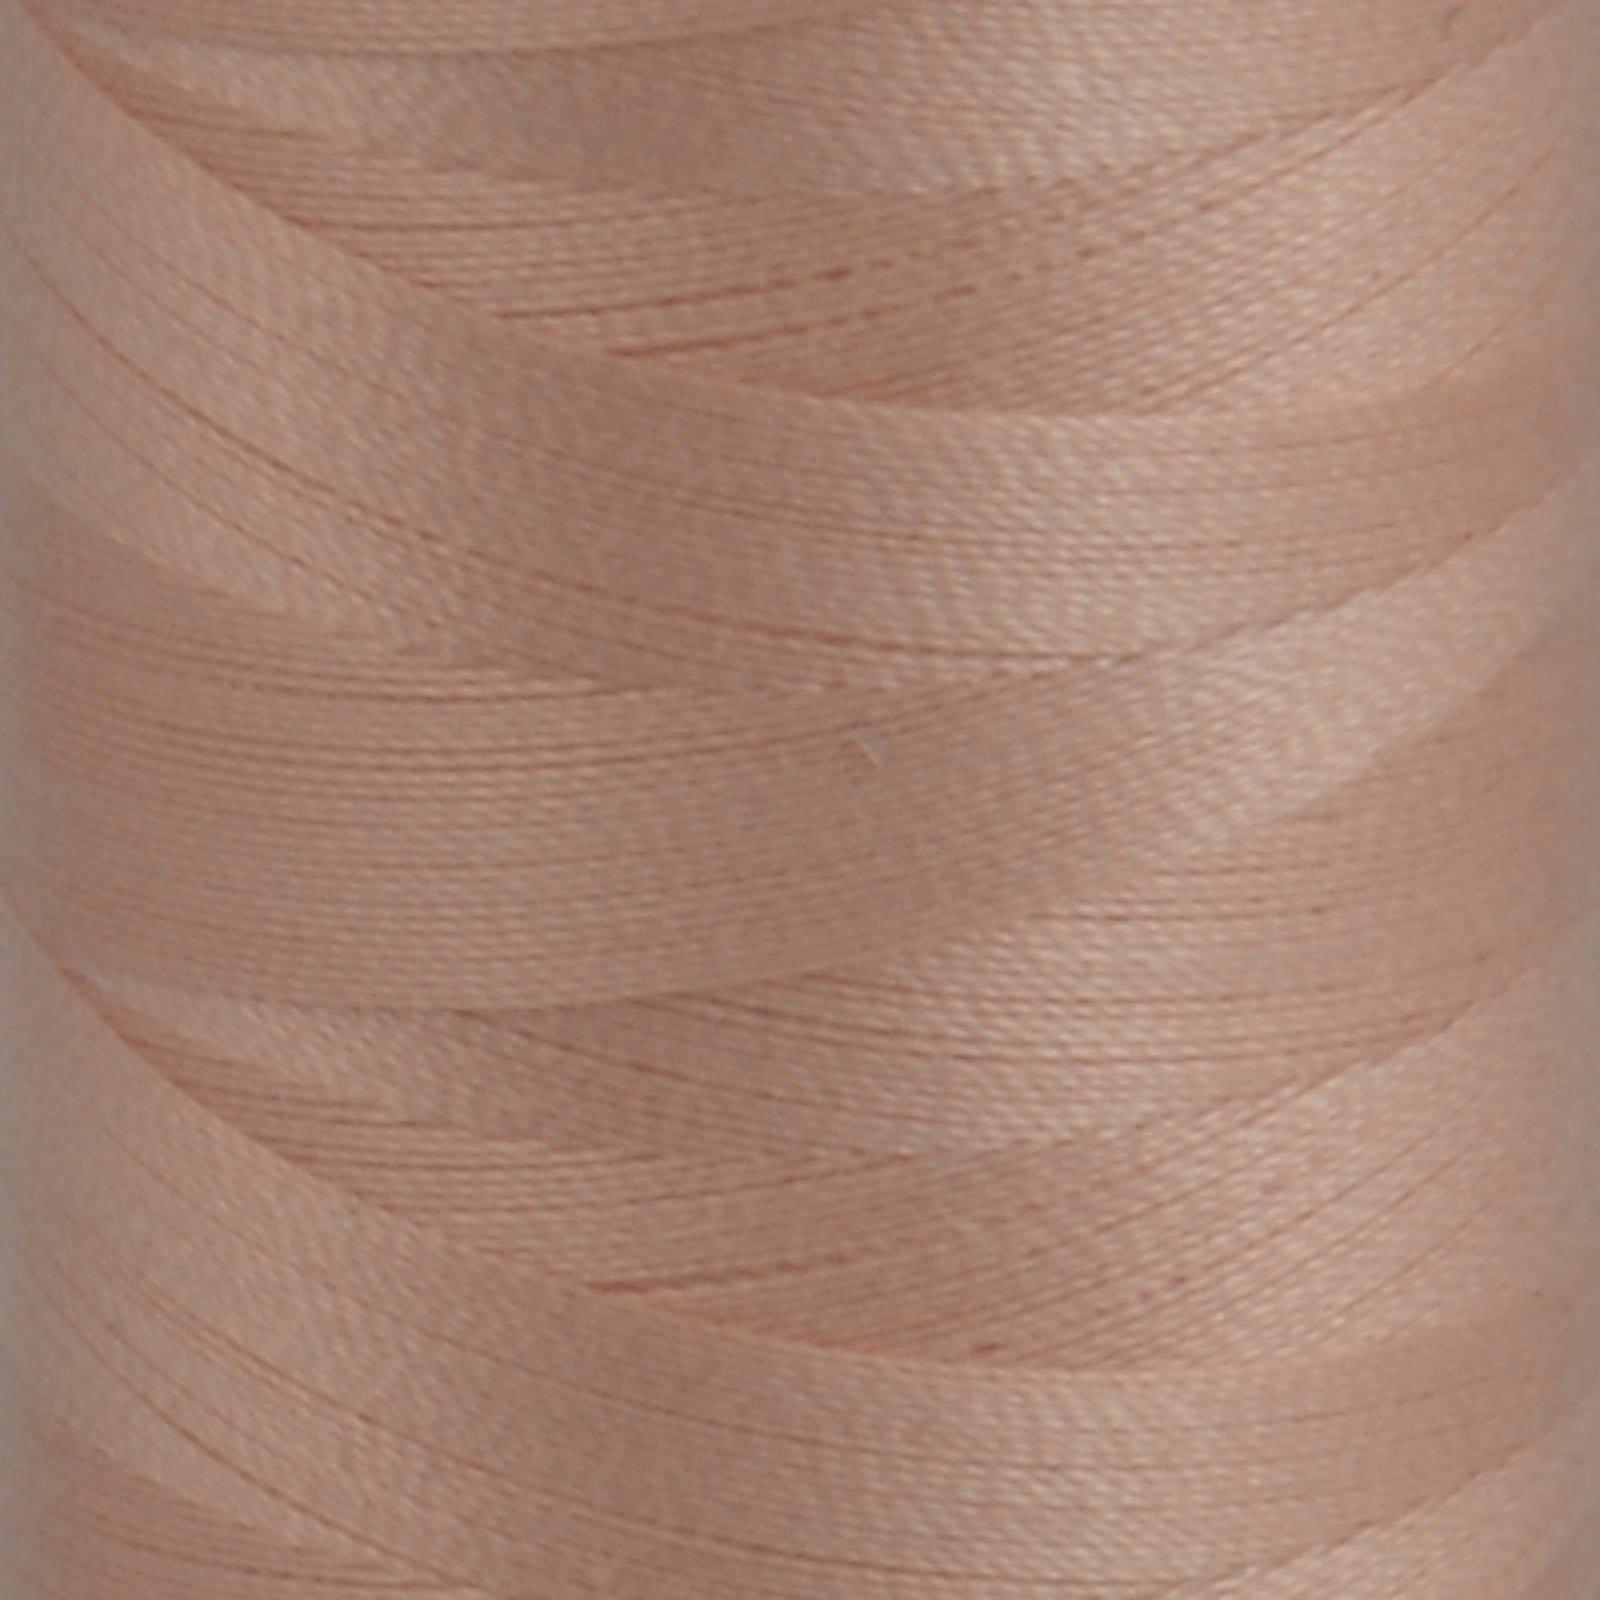 # 2420 Fleshy Pink